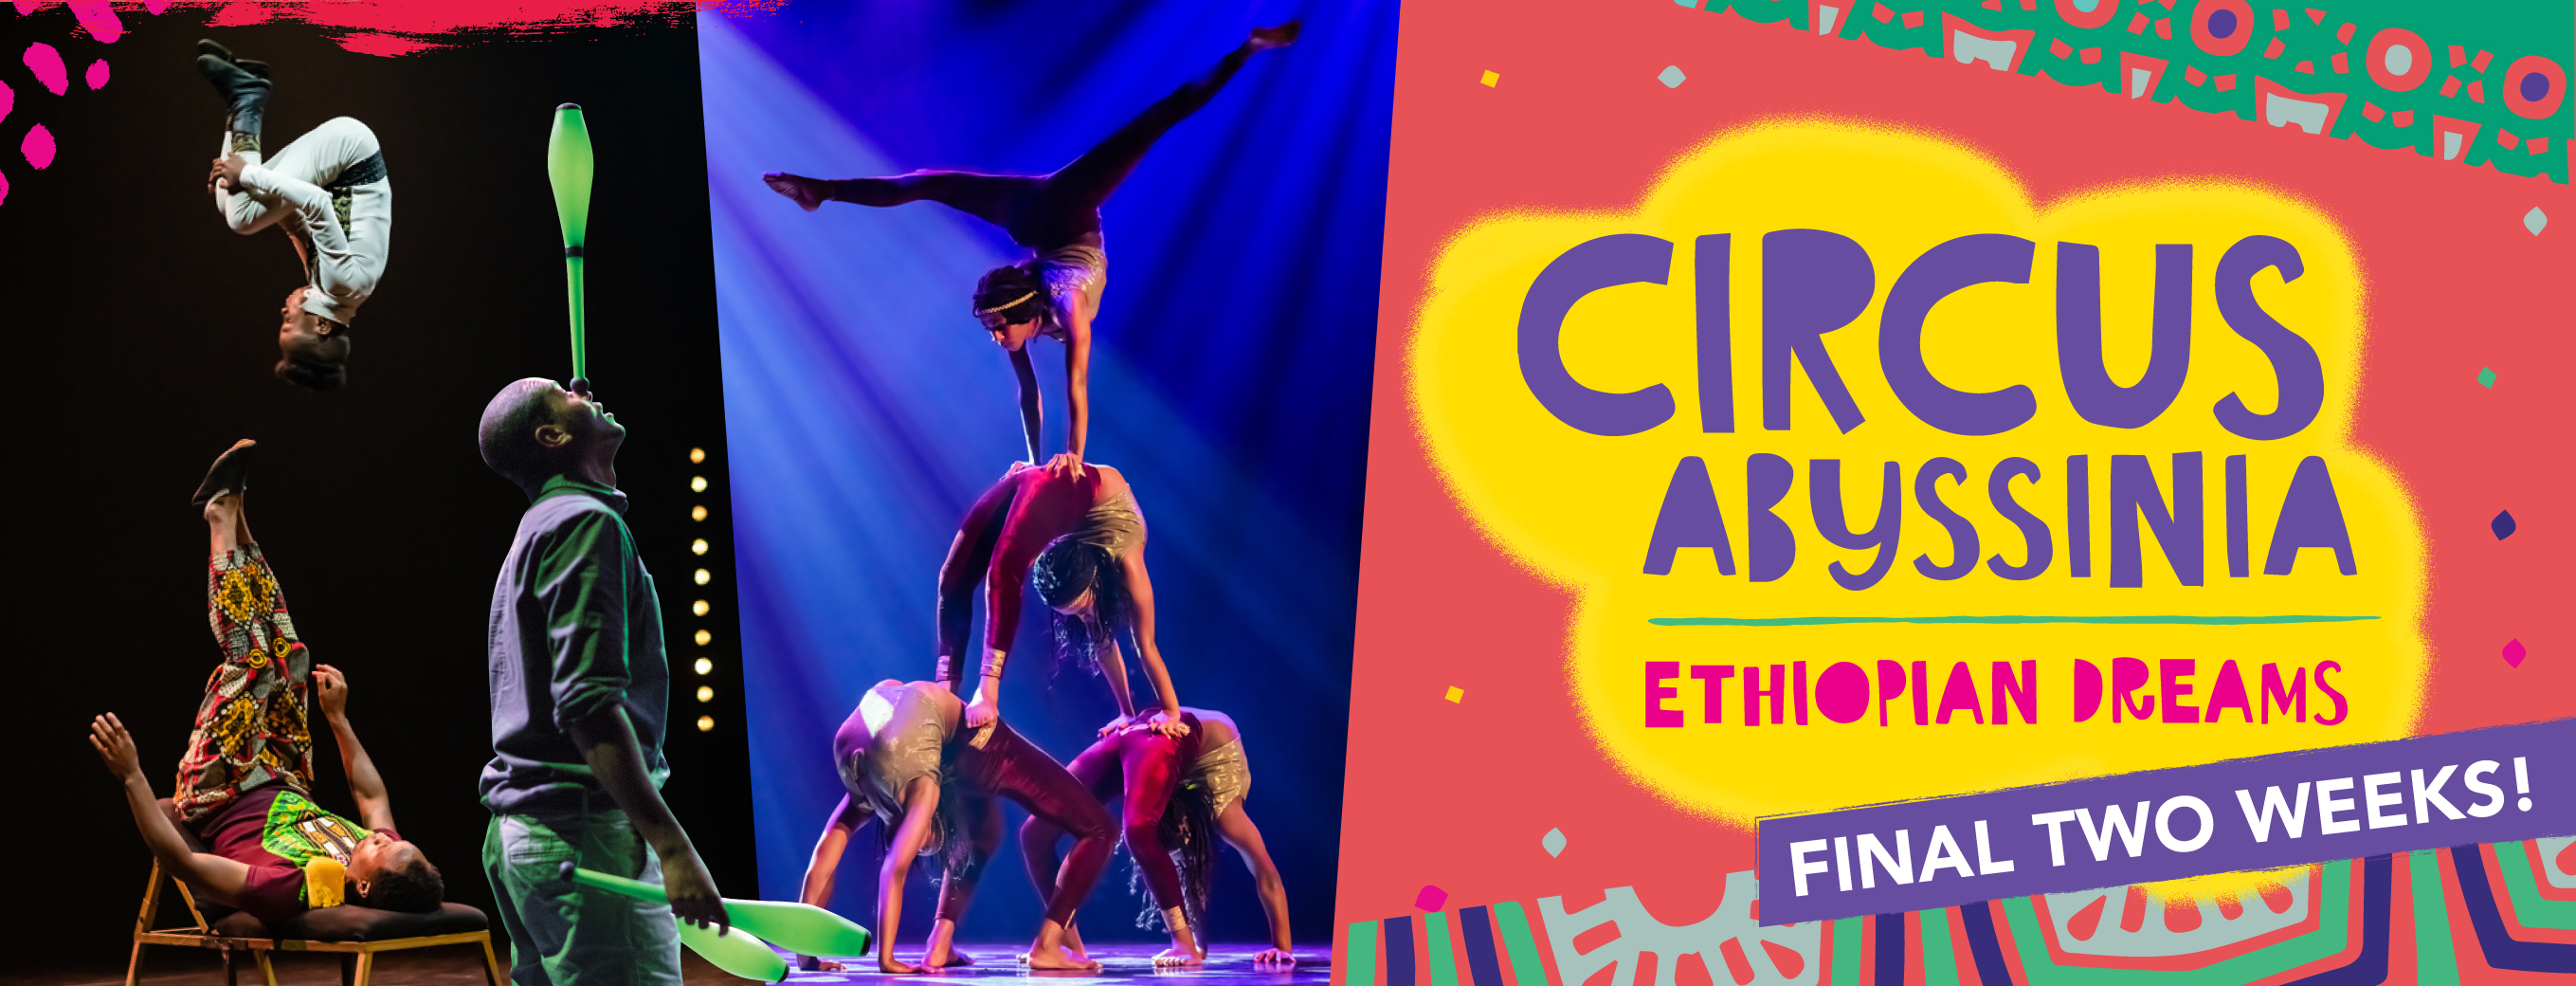 Final Two Weeks! Circus Abyssinia: Ethiopian Dreams